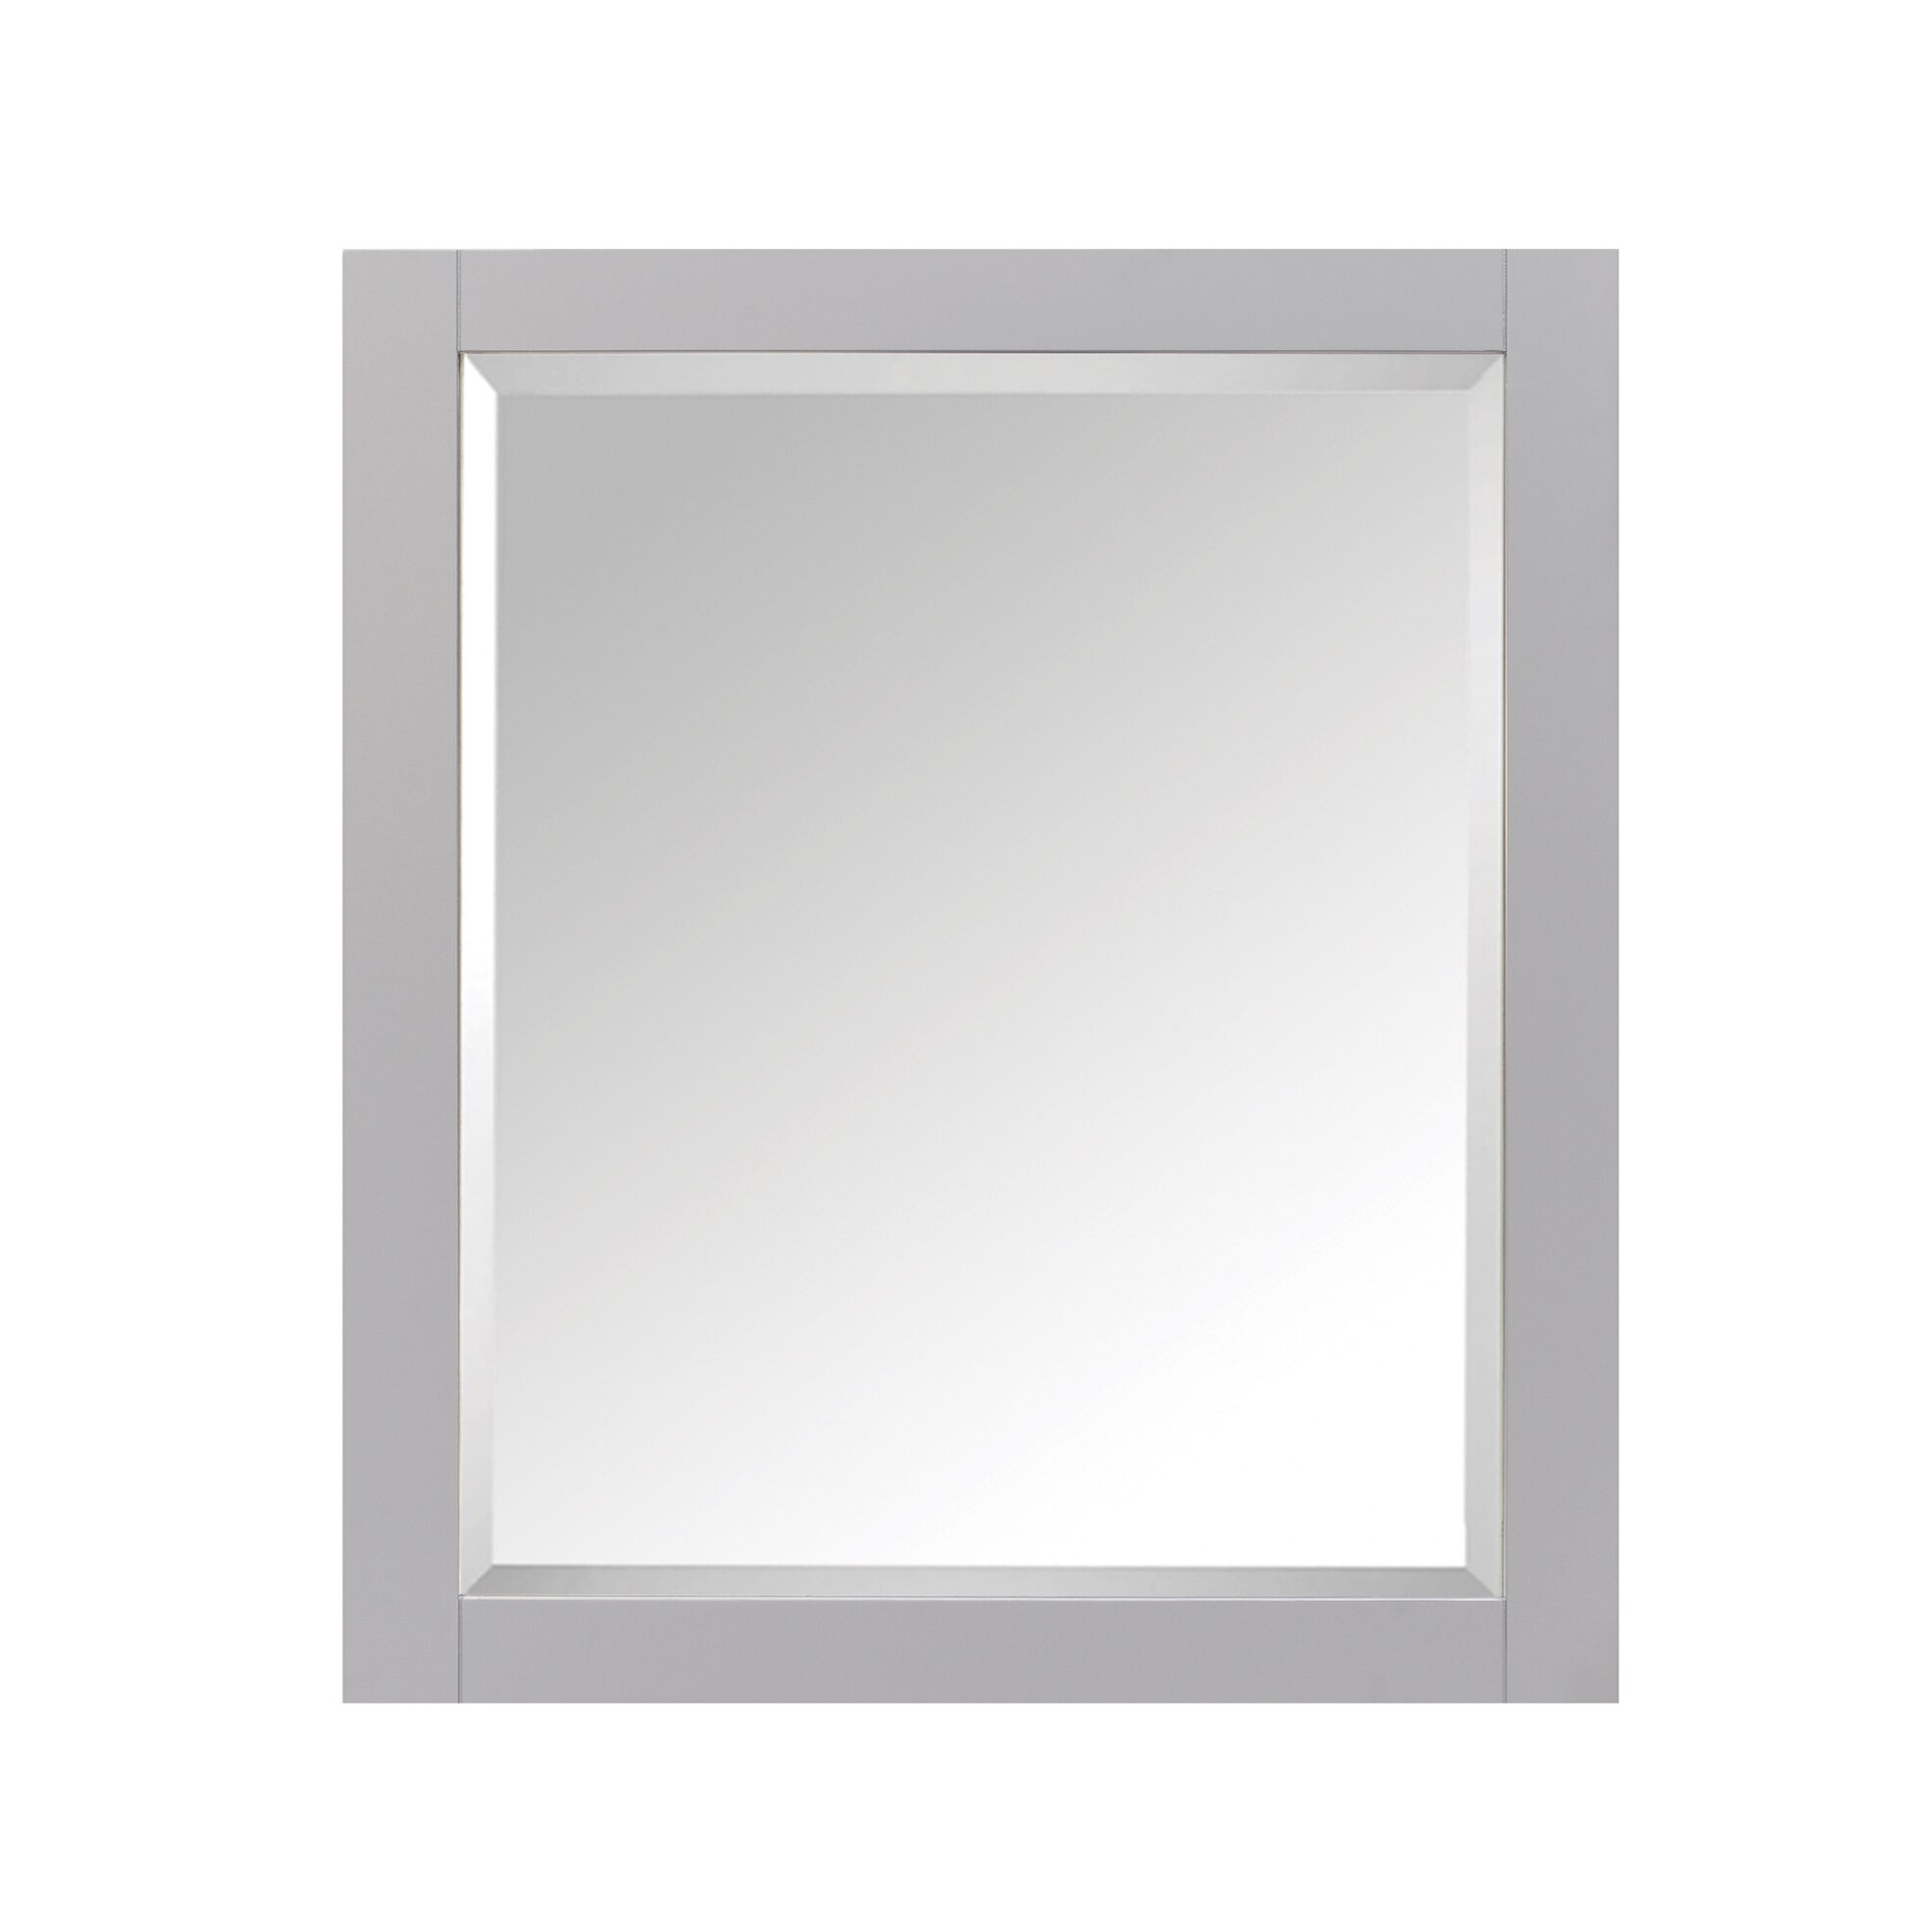 Avanity 14000 mirror wall mounted cabinet wayfair - Wall mounted mirrored bathroom cabinet ...